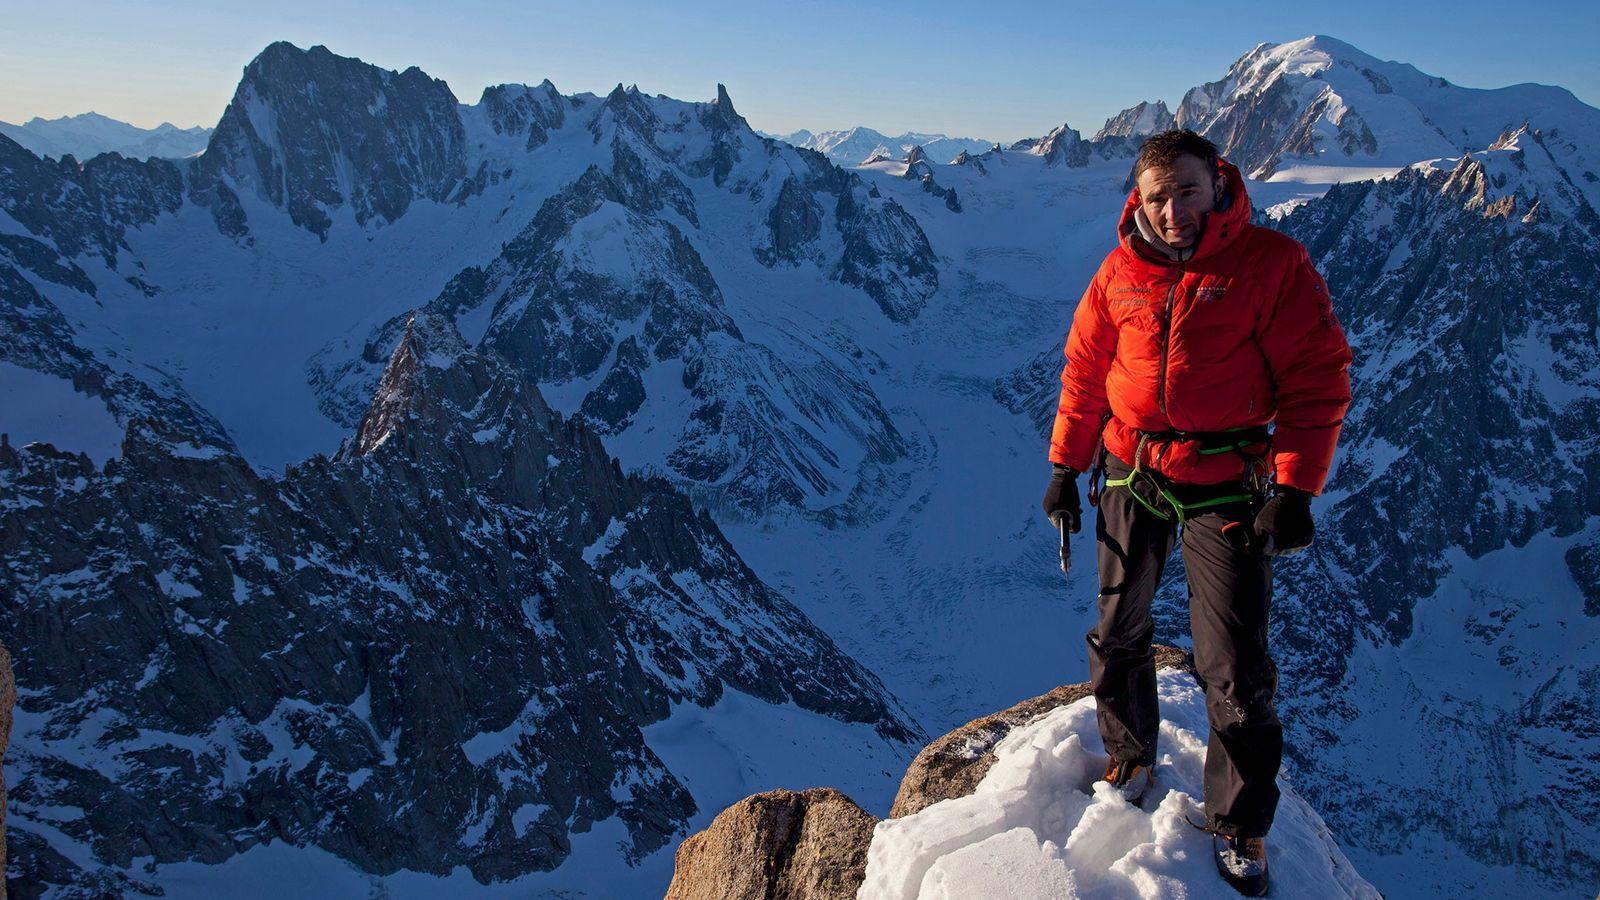 Climber Ueli Steck on the Summit of Les Drus, France